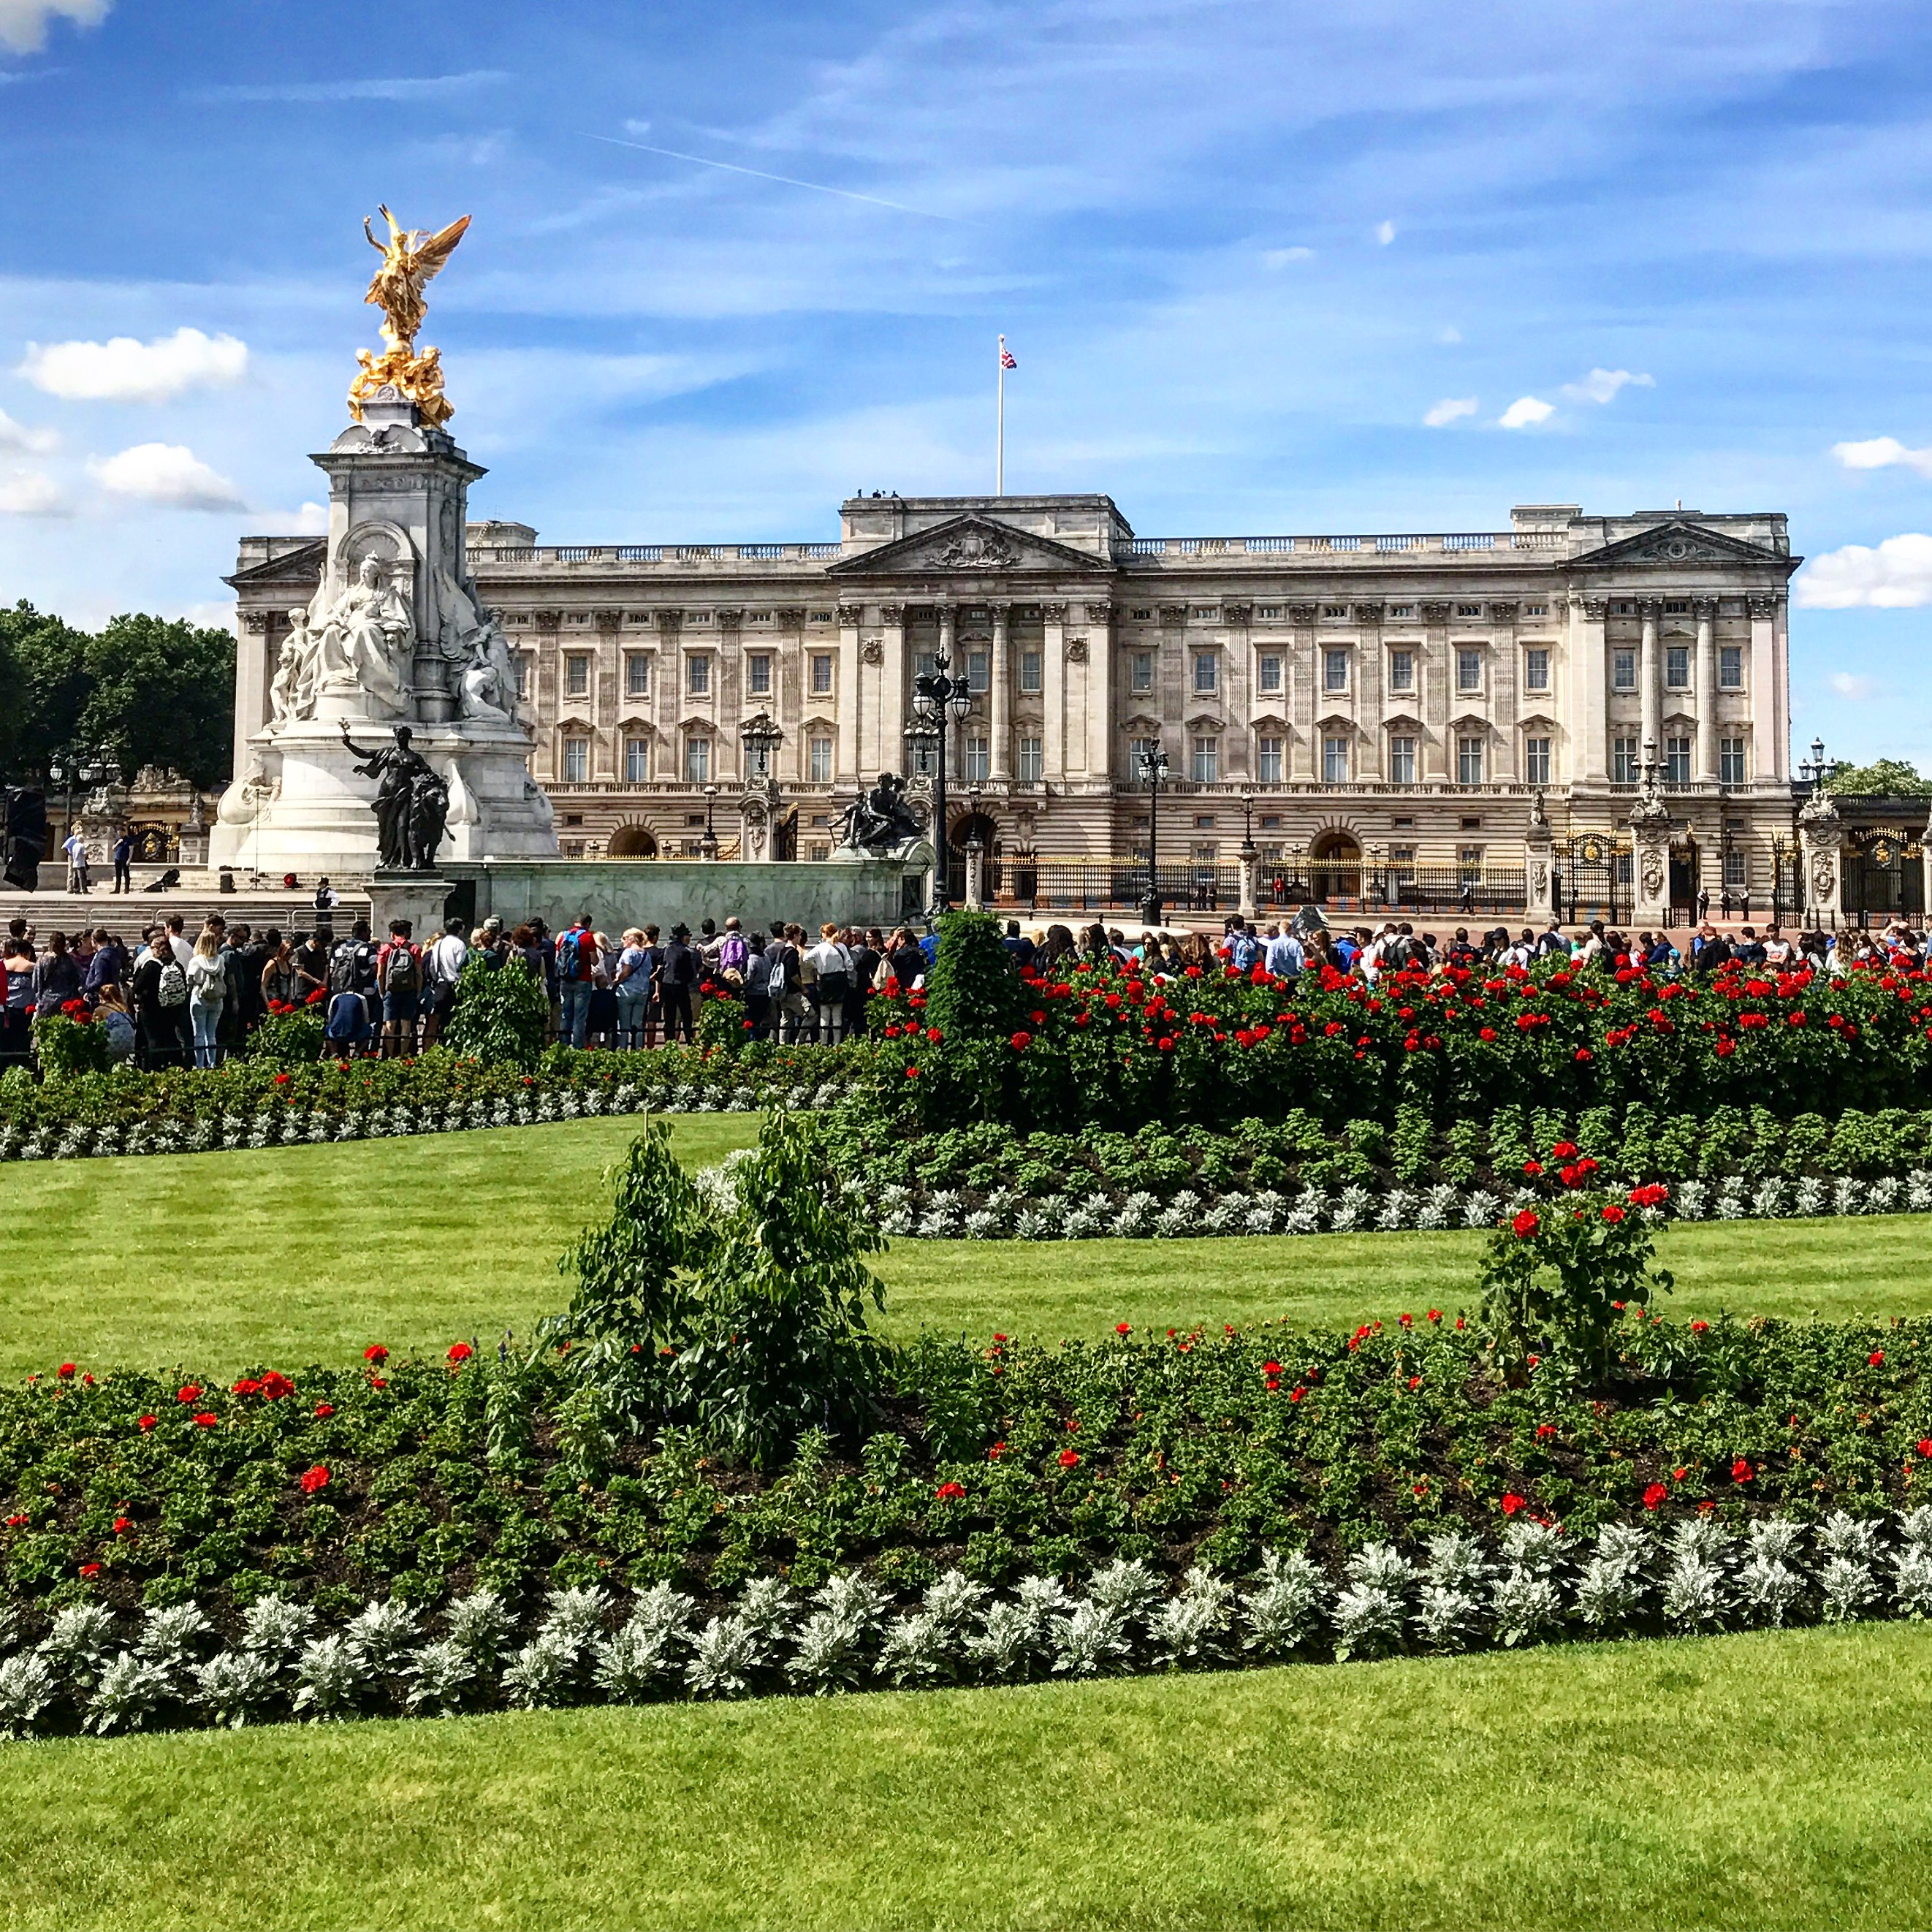 news from buckingham palace - HD2644×2644